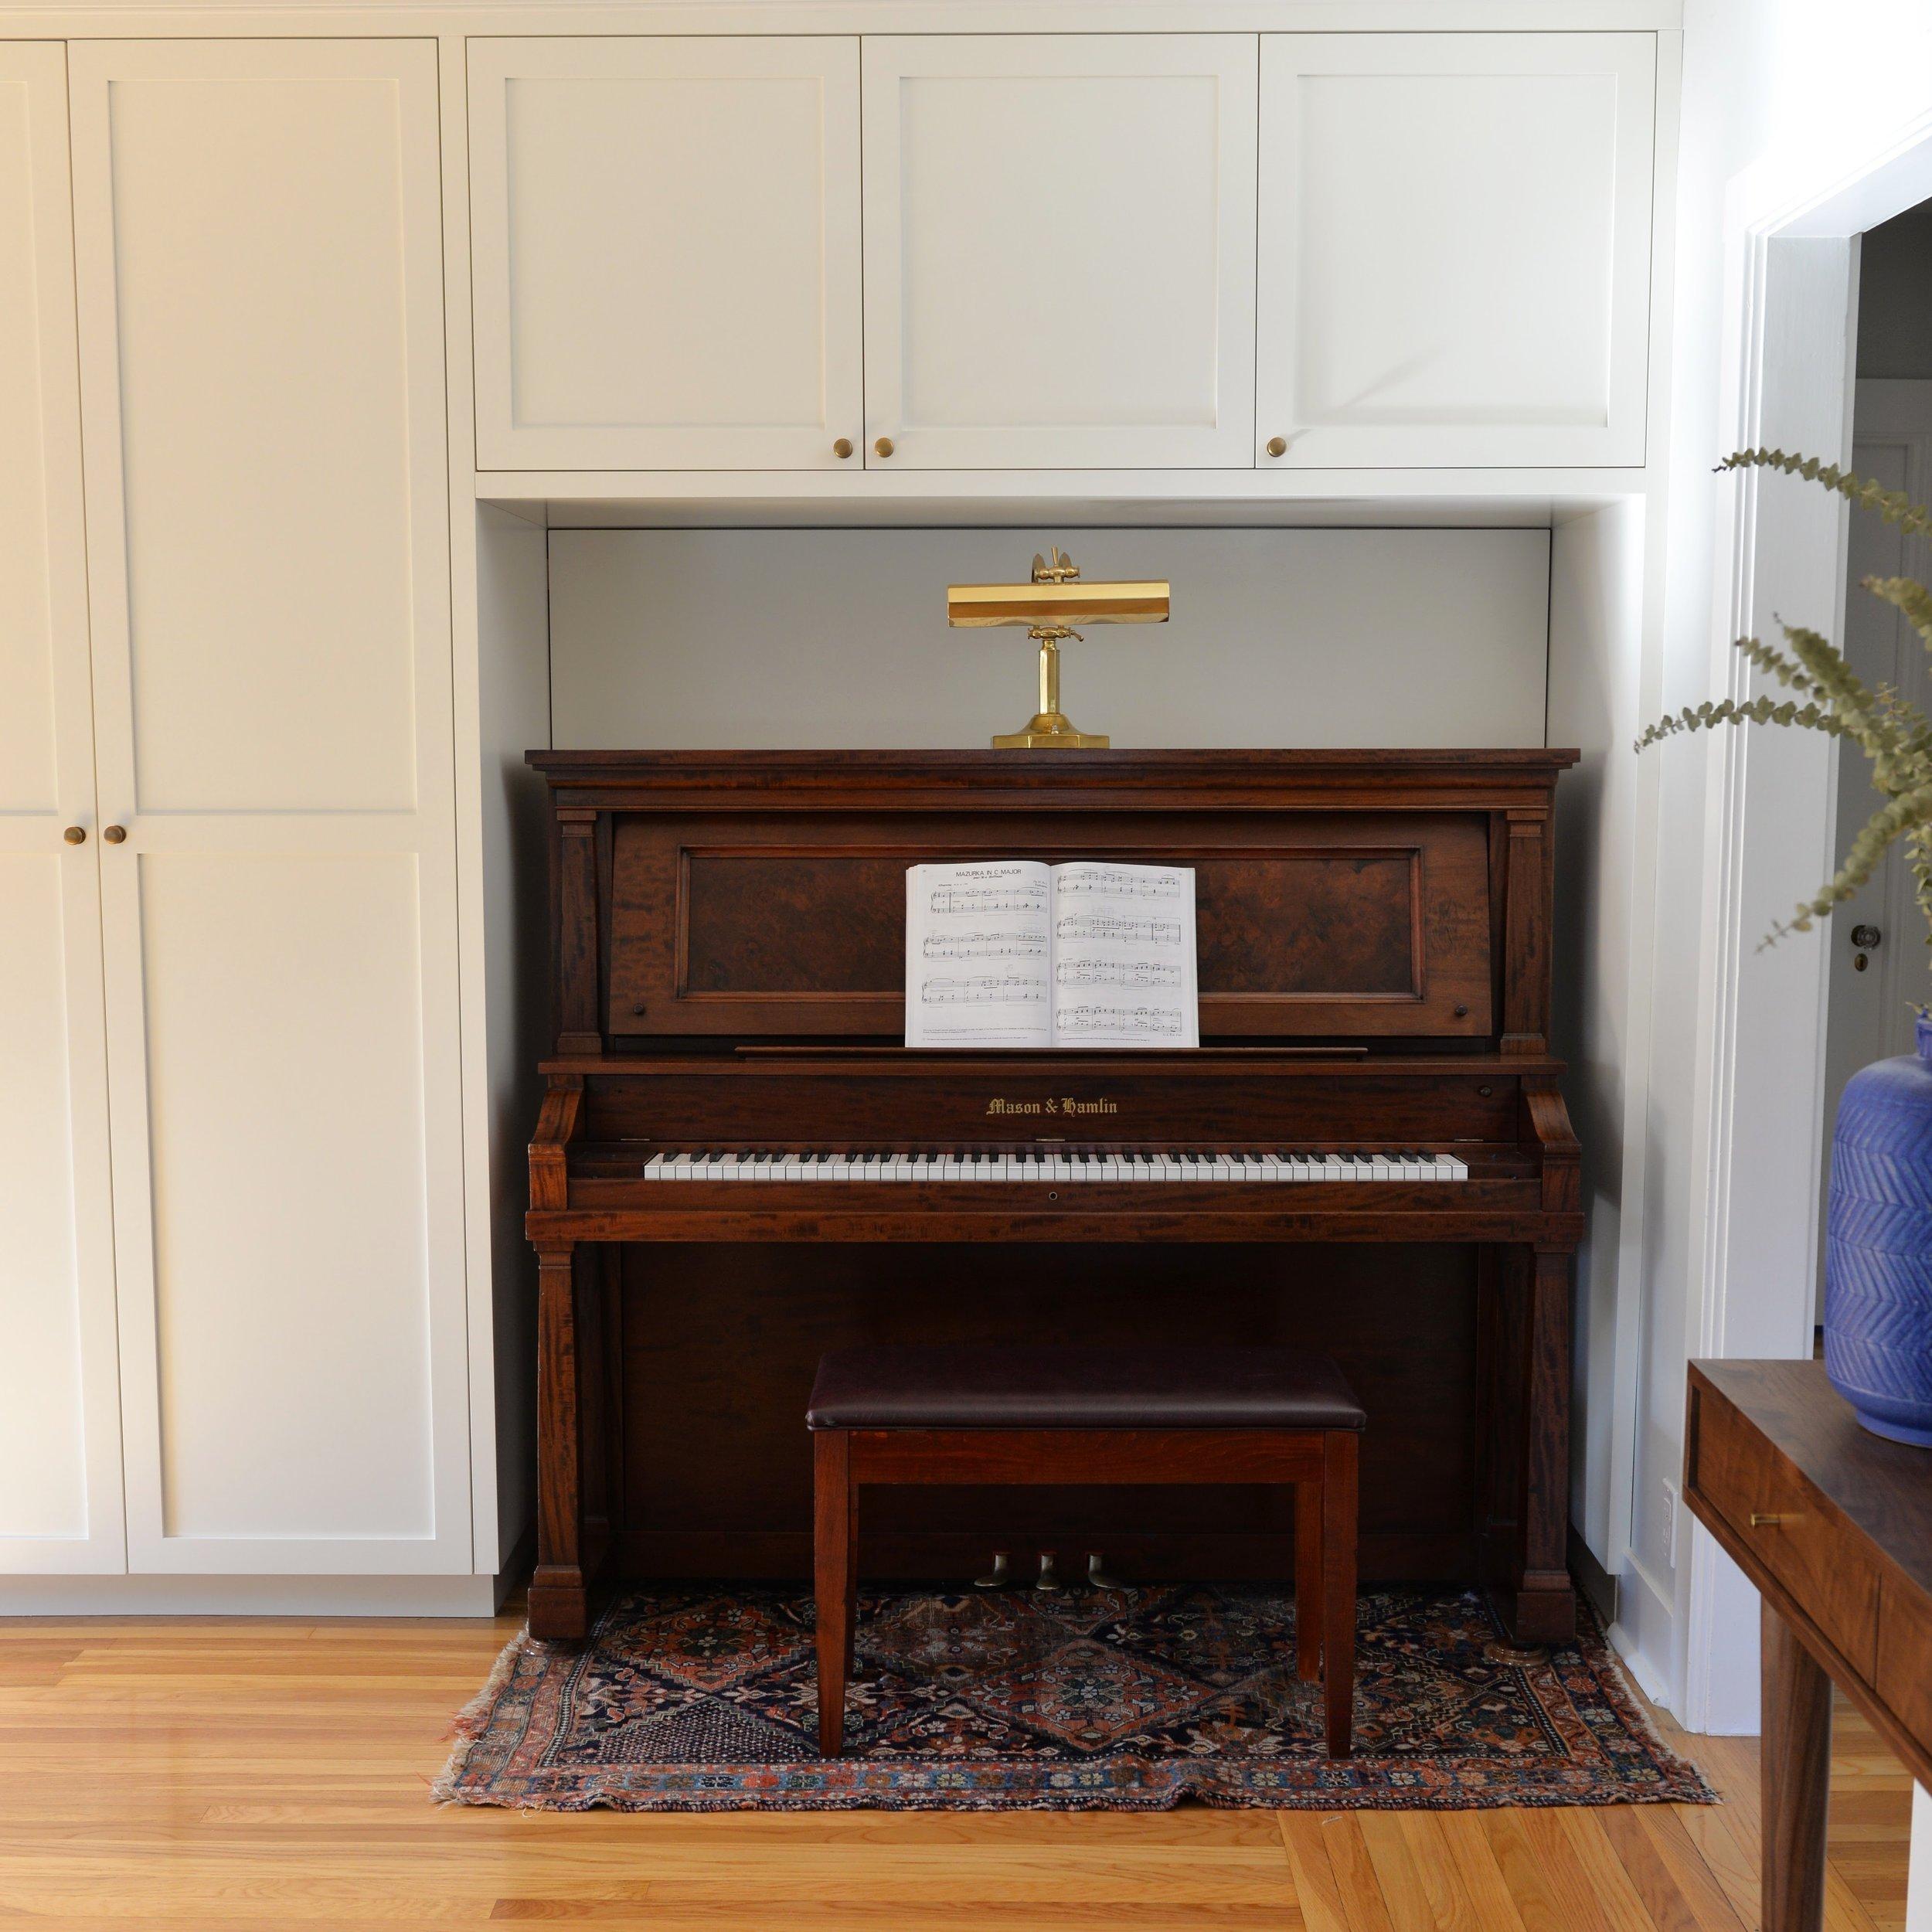 The whole piano